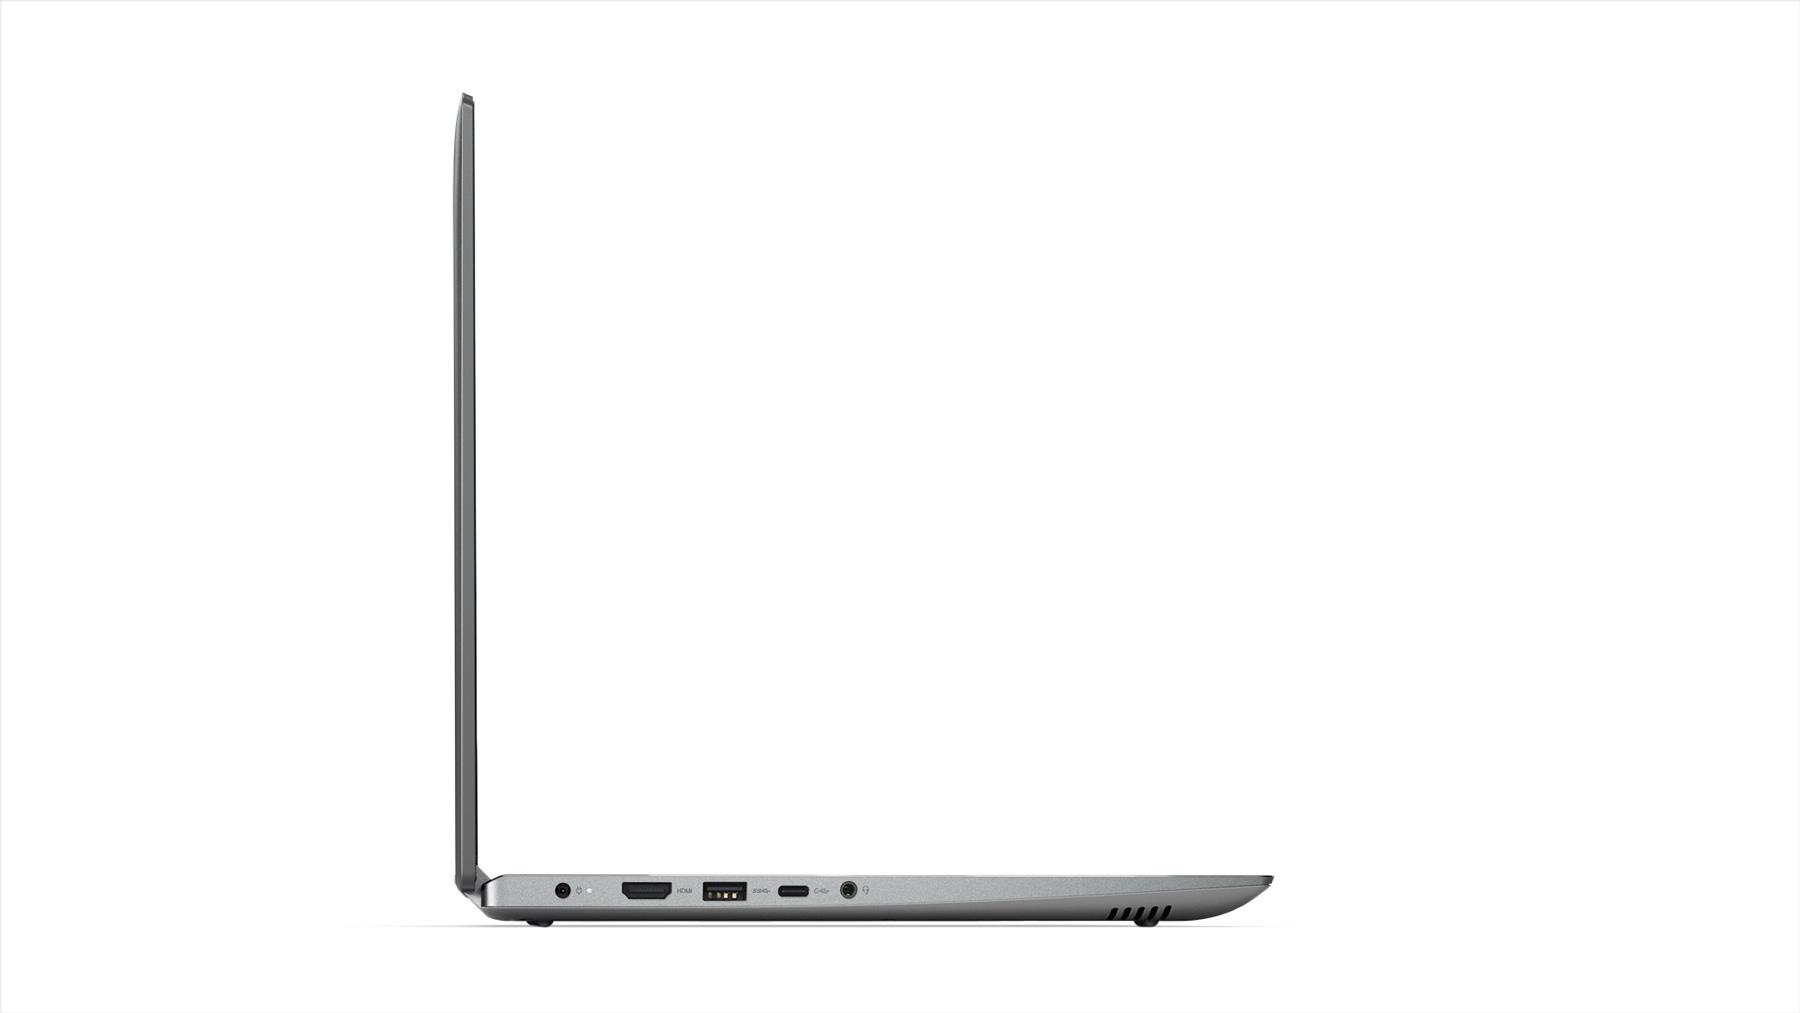 Фото  Ультрабук Lenovo Yoga 520 Mineral Grey (81C800CXRA)